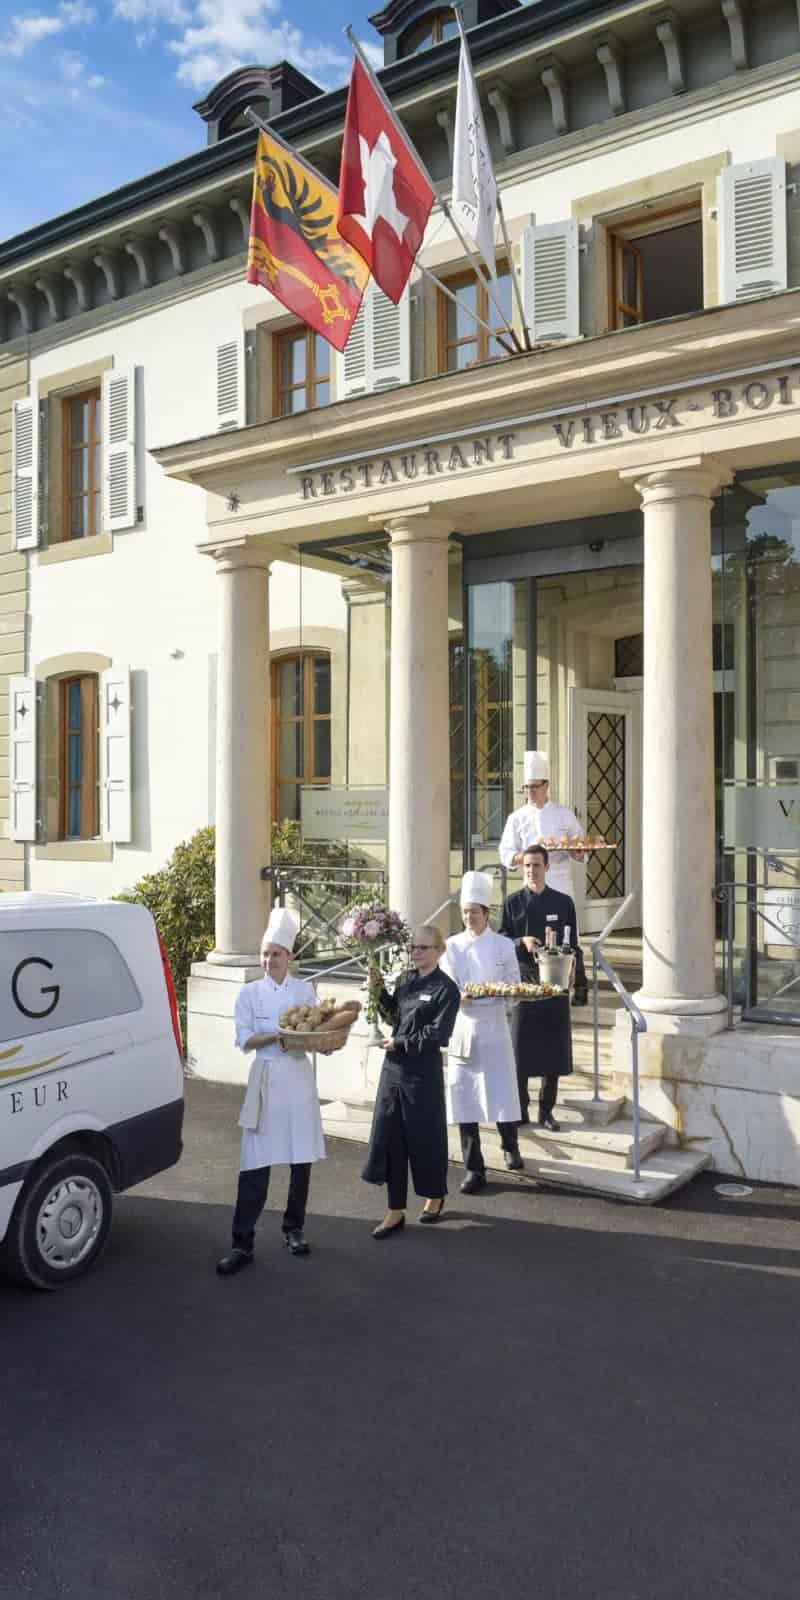 Cuisine Professionnelle Geneve